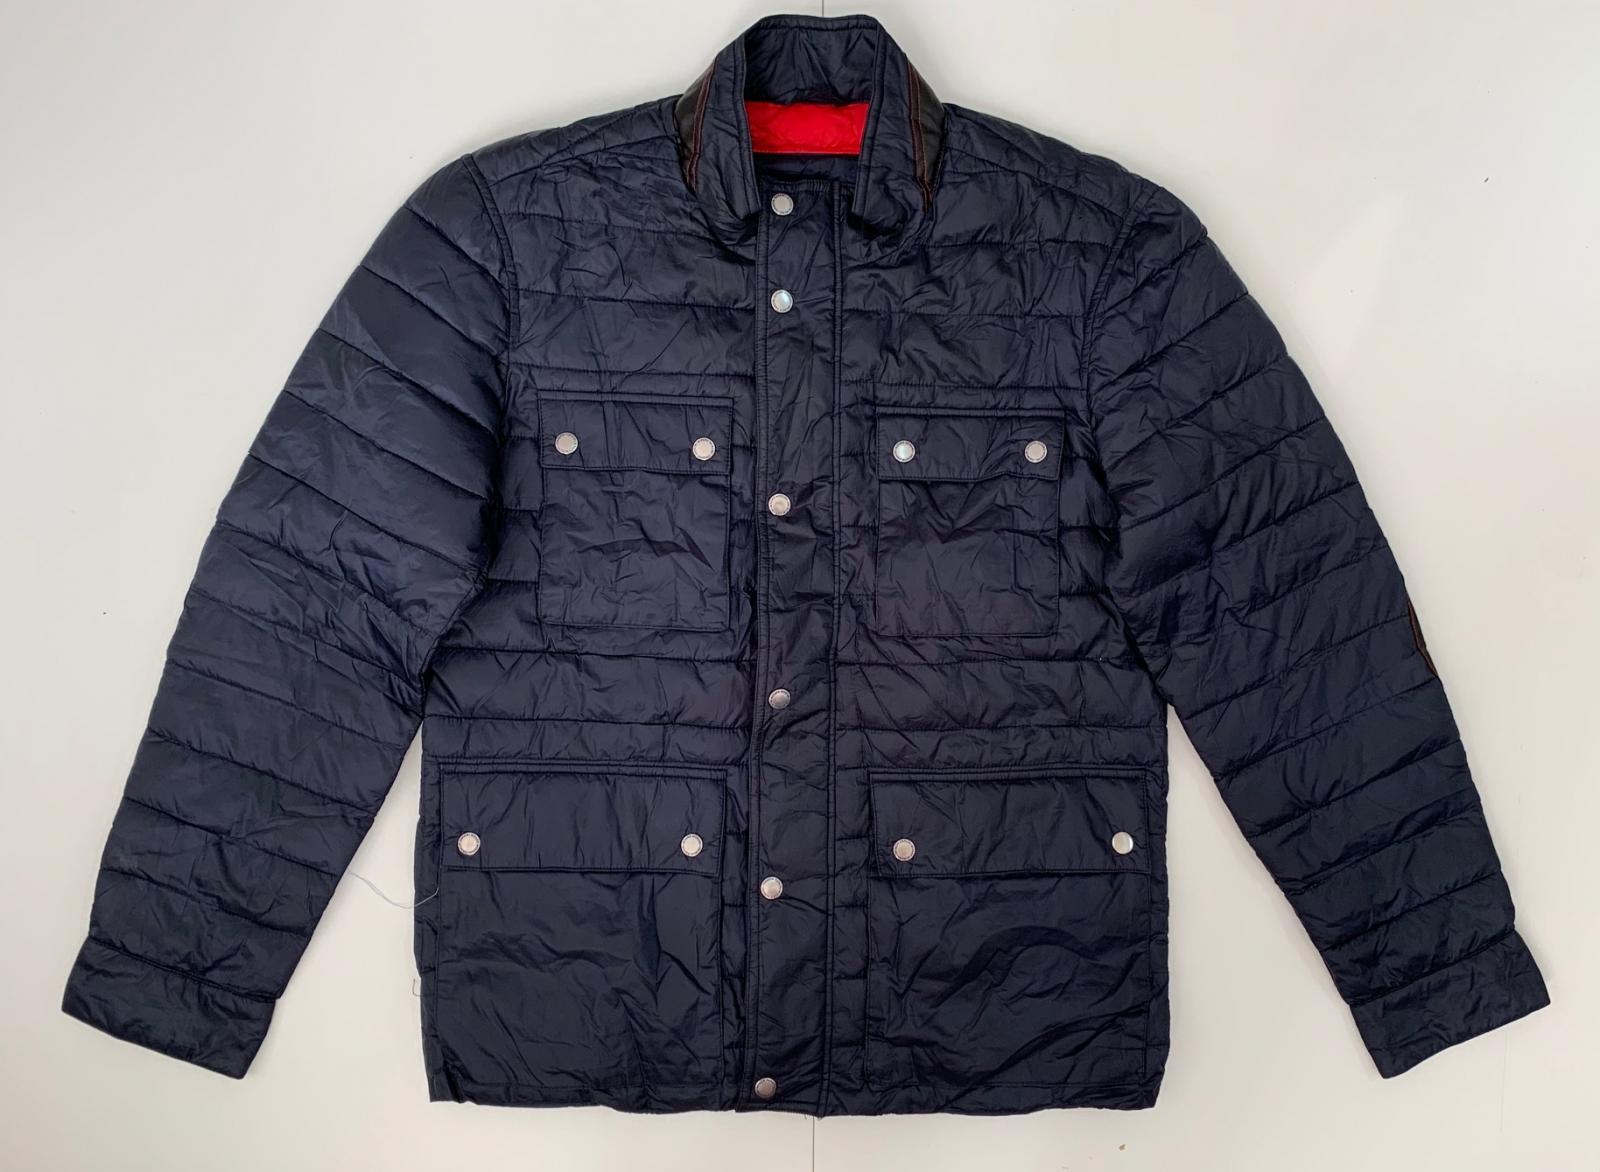 Оригинальная темно-синяя куртка для мужчин